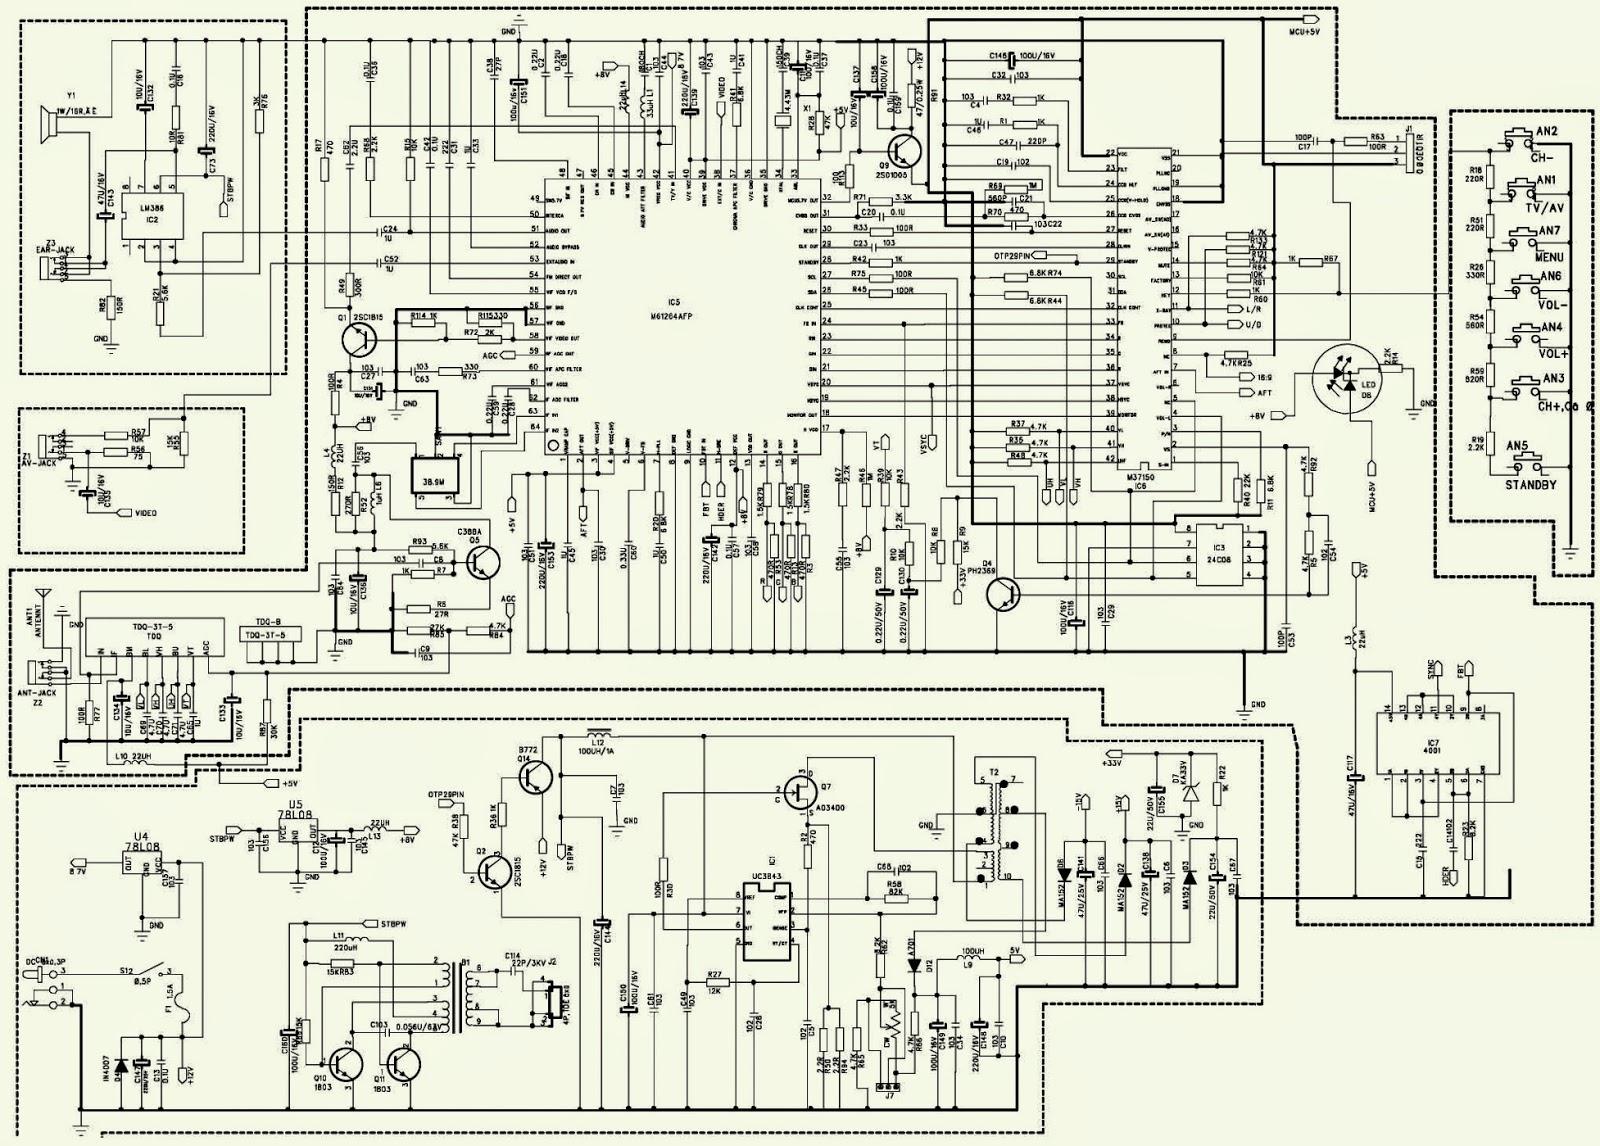 Flat Trailer Wiring Diagram Led Get Free Image About Wiring Diagram